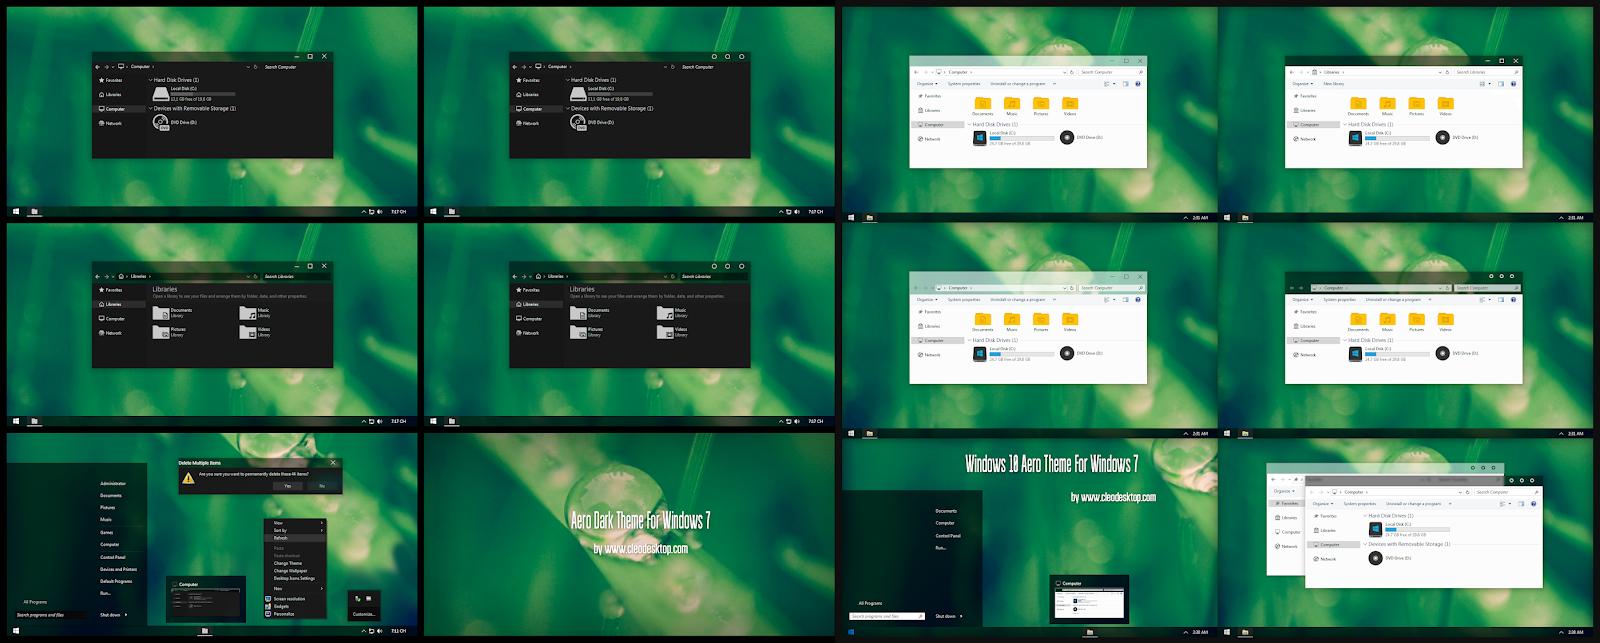 Aero Dark and Light Theme For Windows 7 - Cleodesktop I Customized